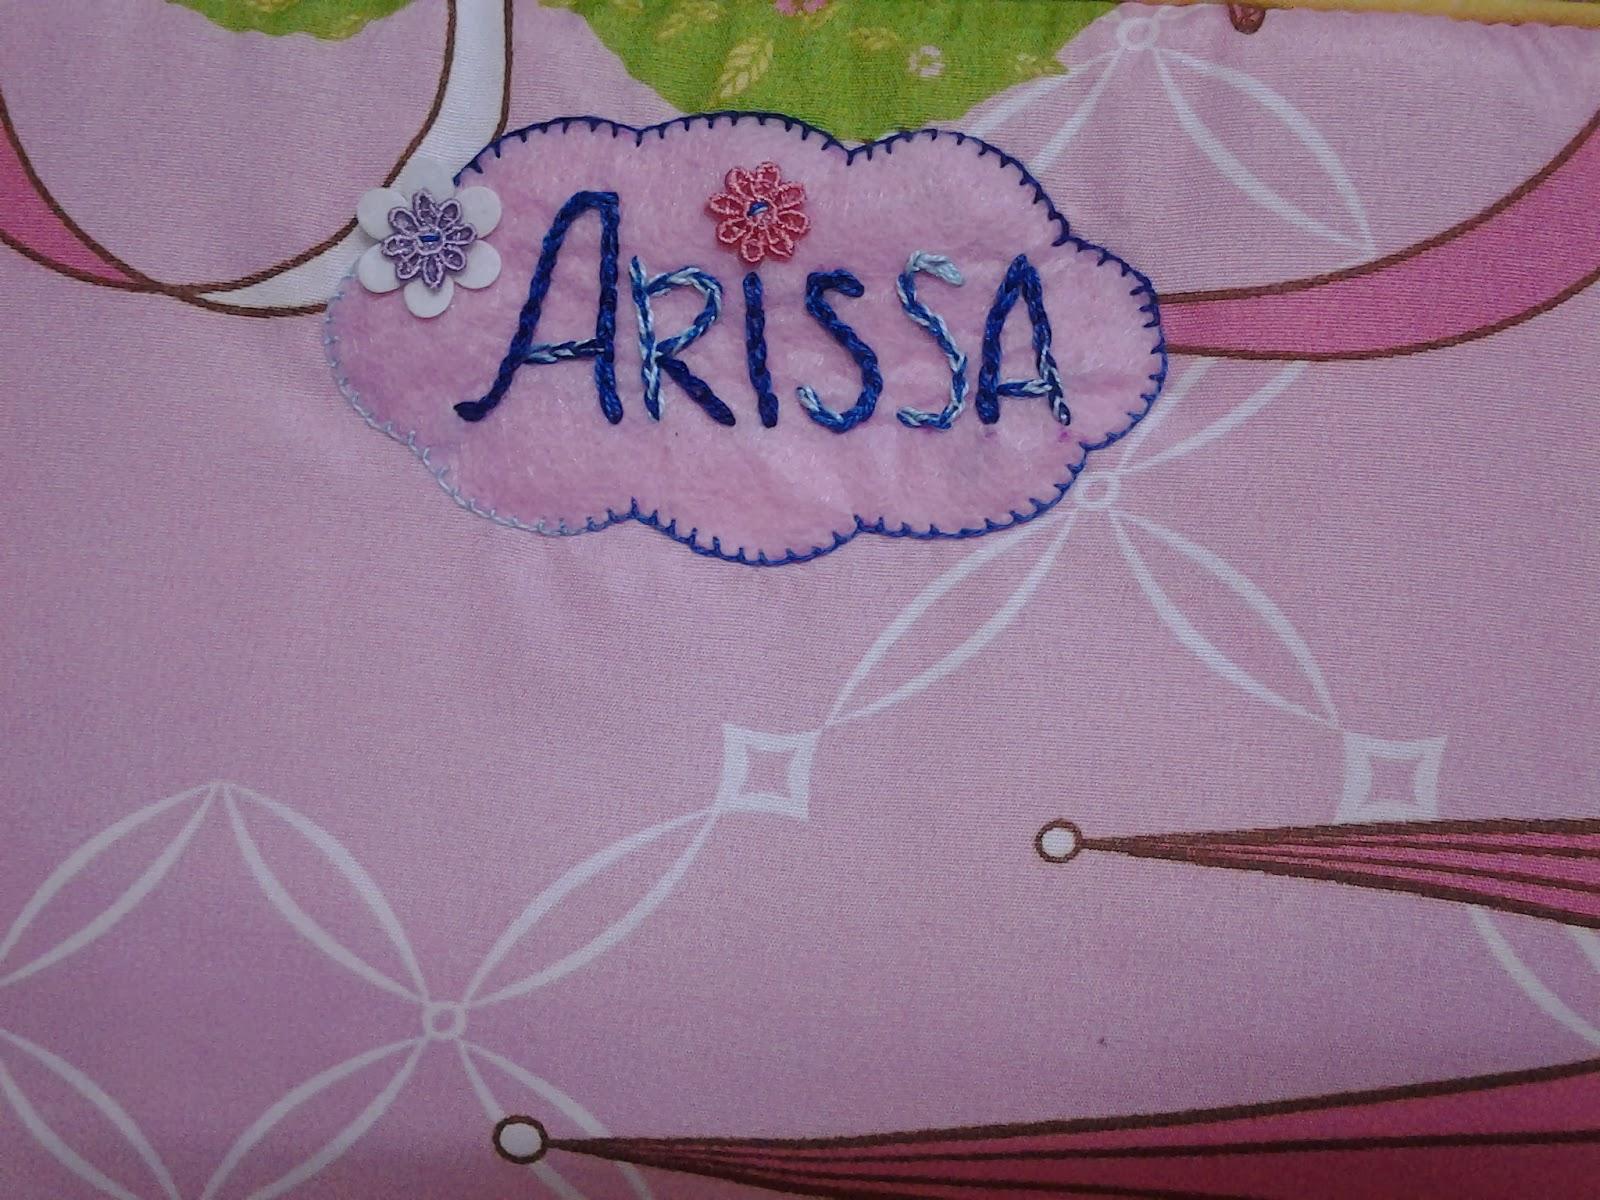 sbb x suke tgk cikgu tulis nama arissa gune marker kat beg pampers baju & botol susu arissa